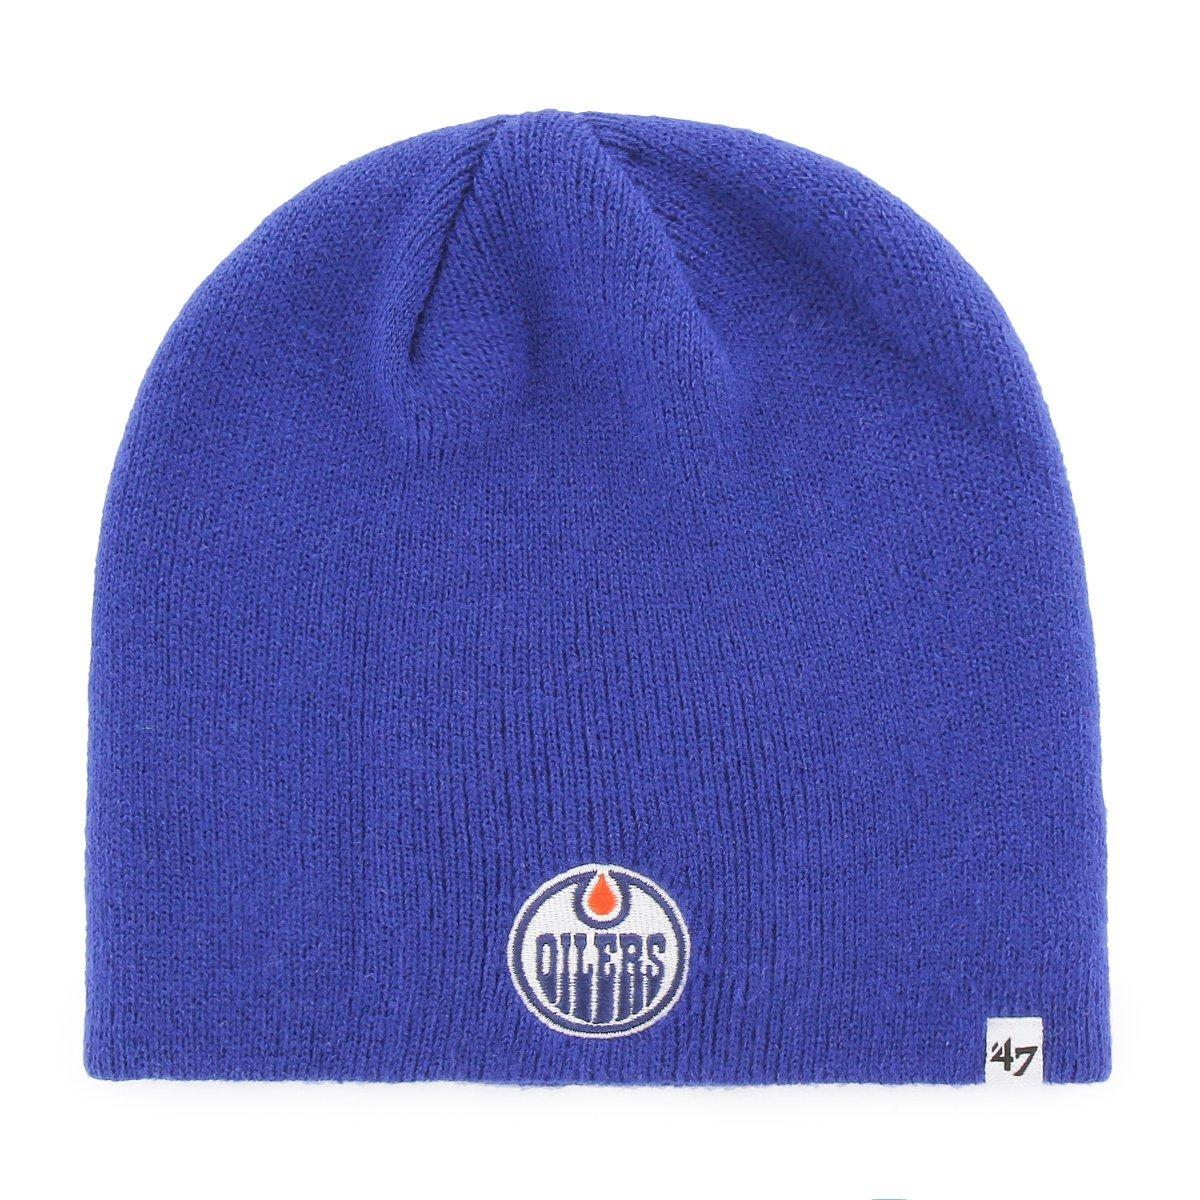 '47 Brand Edmonton Oilers Beanie NHL Wintermü tze Blau